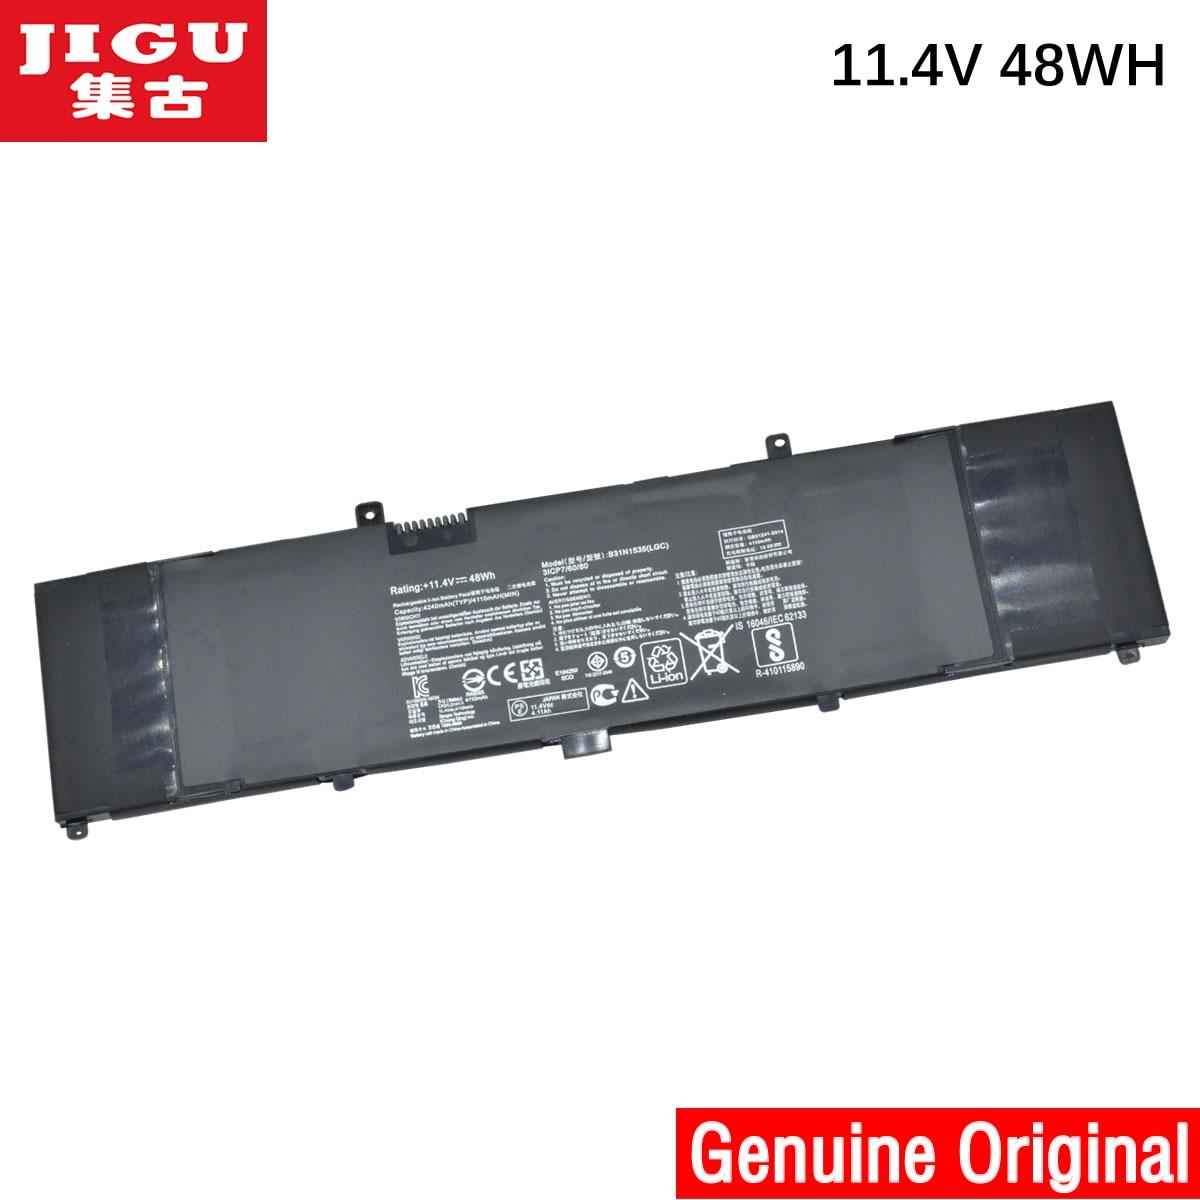 JIGU B31N1535 بطارية كمبيوتر محمول ل ASUS ZenBook UX310 UX310UA UX310UQ UX410 UX410UA UX410UQ U4000U U400UQ RX310U 11.4V 48WH